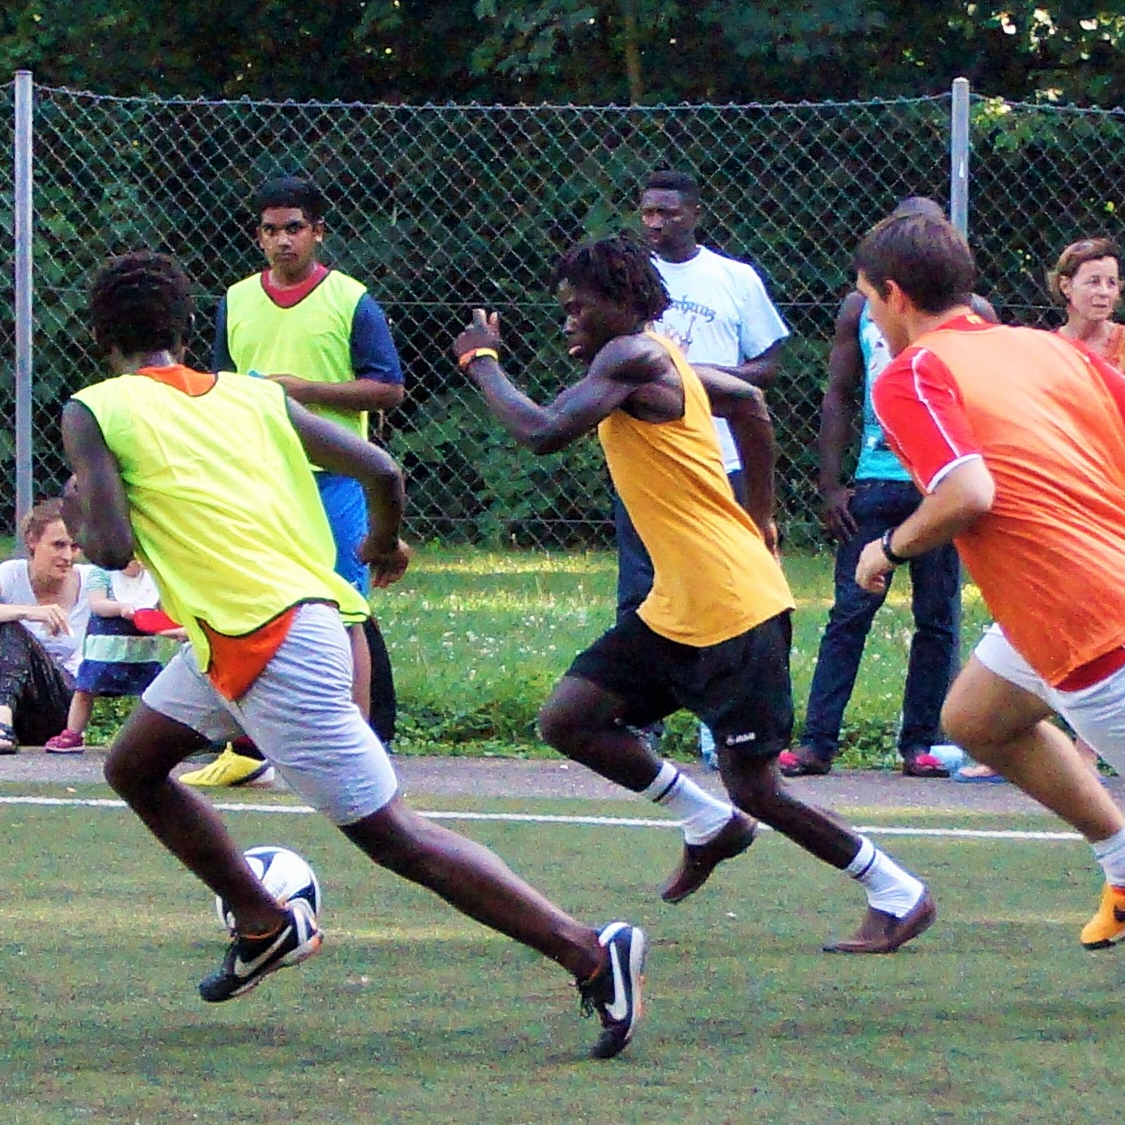 Fußball 2 - quadratisch